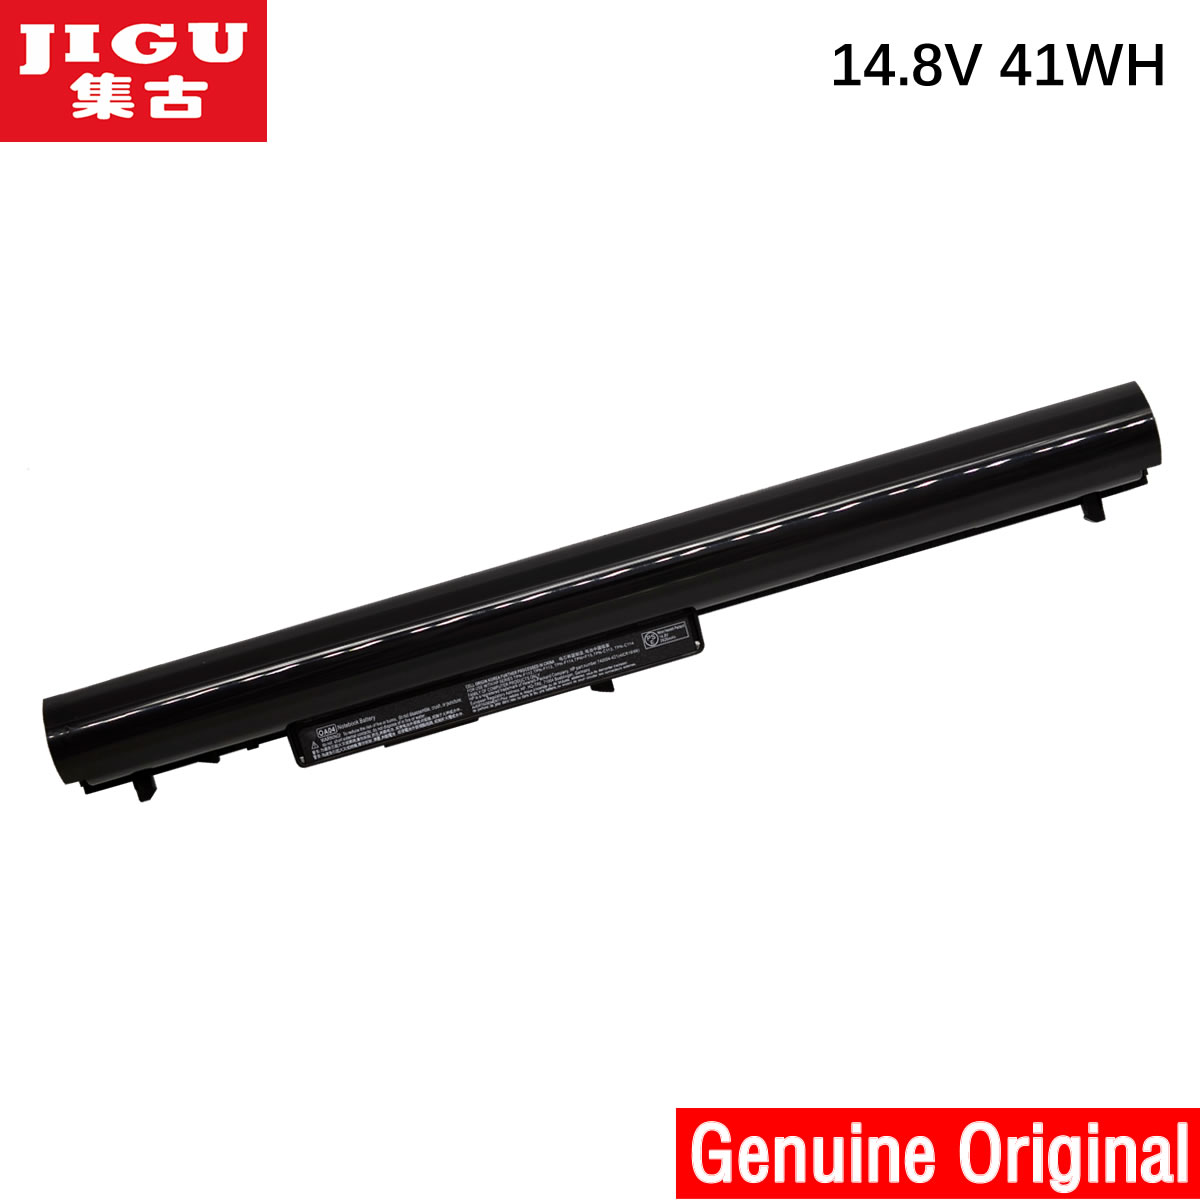 все цены на  JIGU OA04 740715-001 HSTNN-LB5S Original laptop Battery For HP COMPAQ CQ14 CQ15 240 246 250 256 G2 G3  онлайн